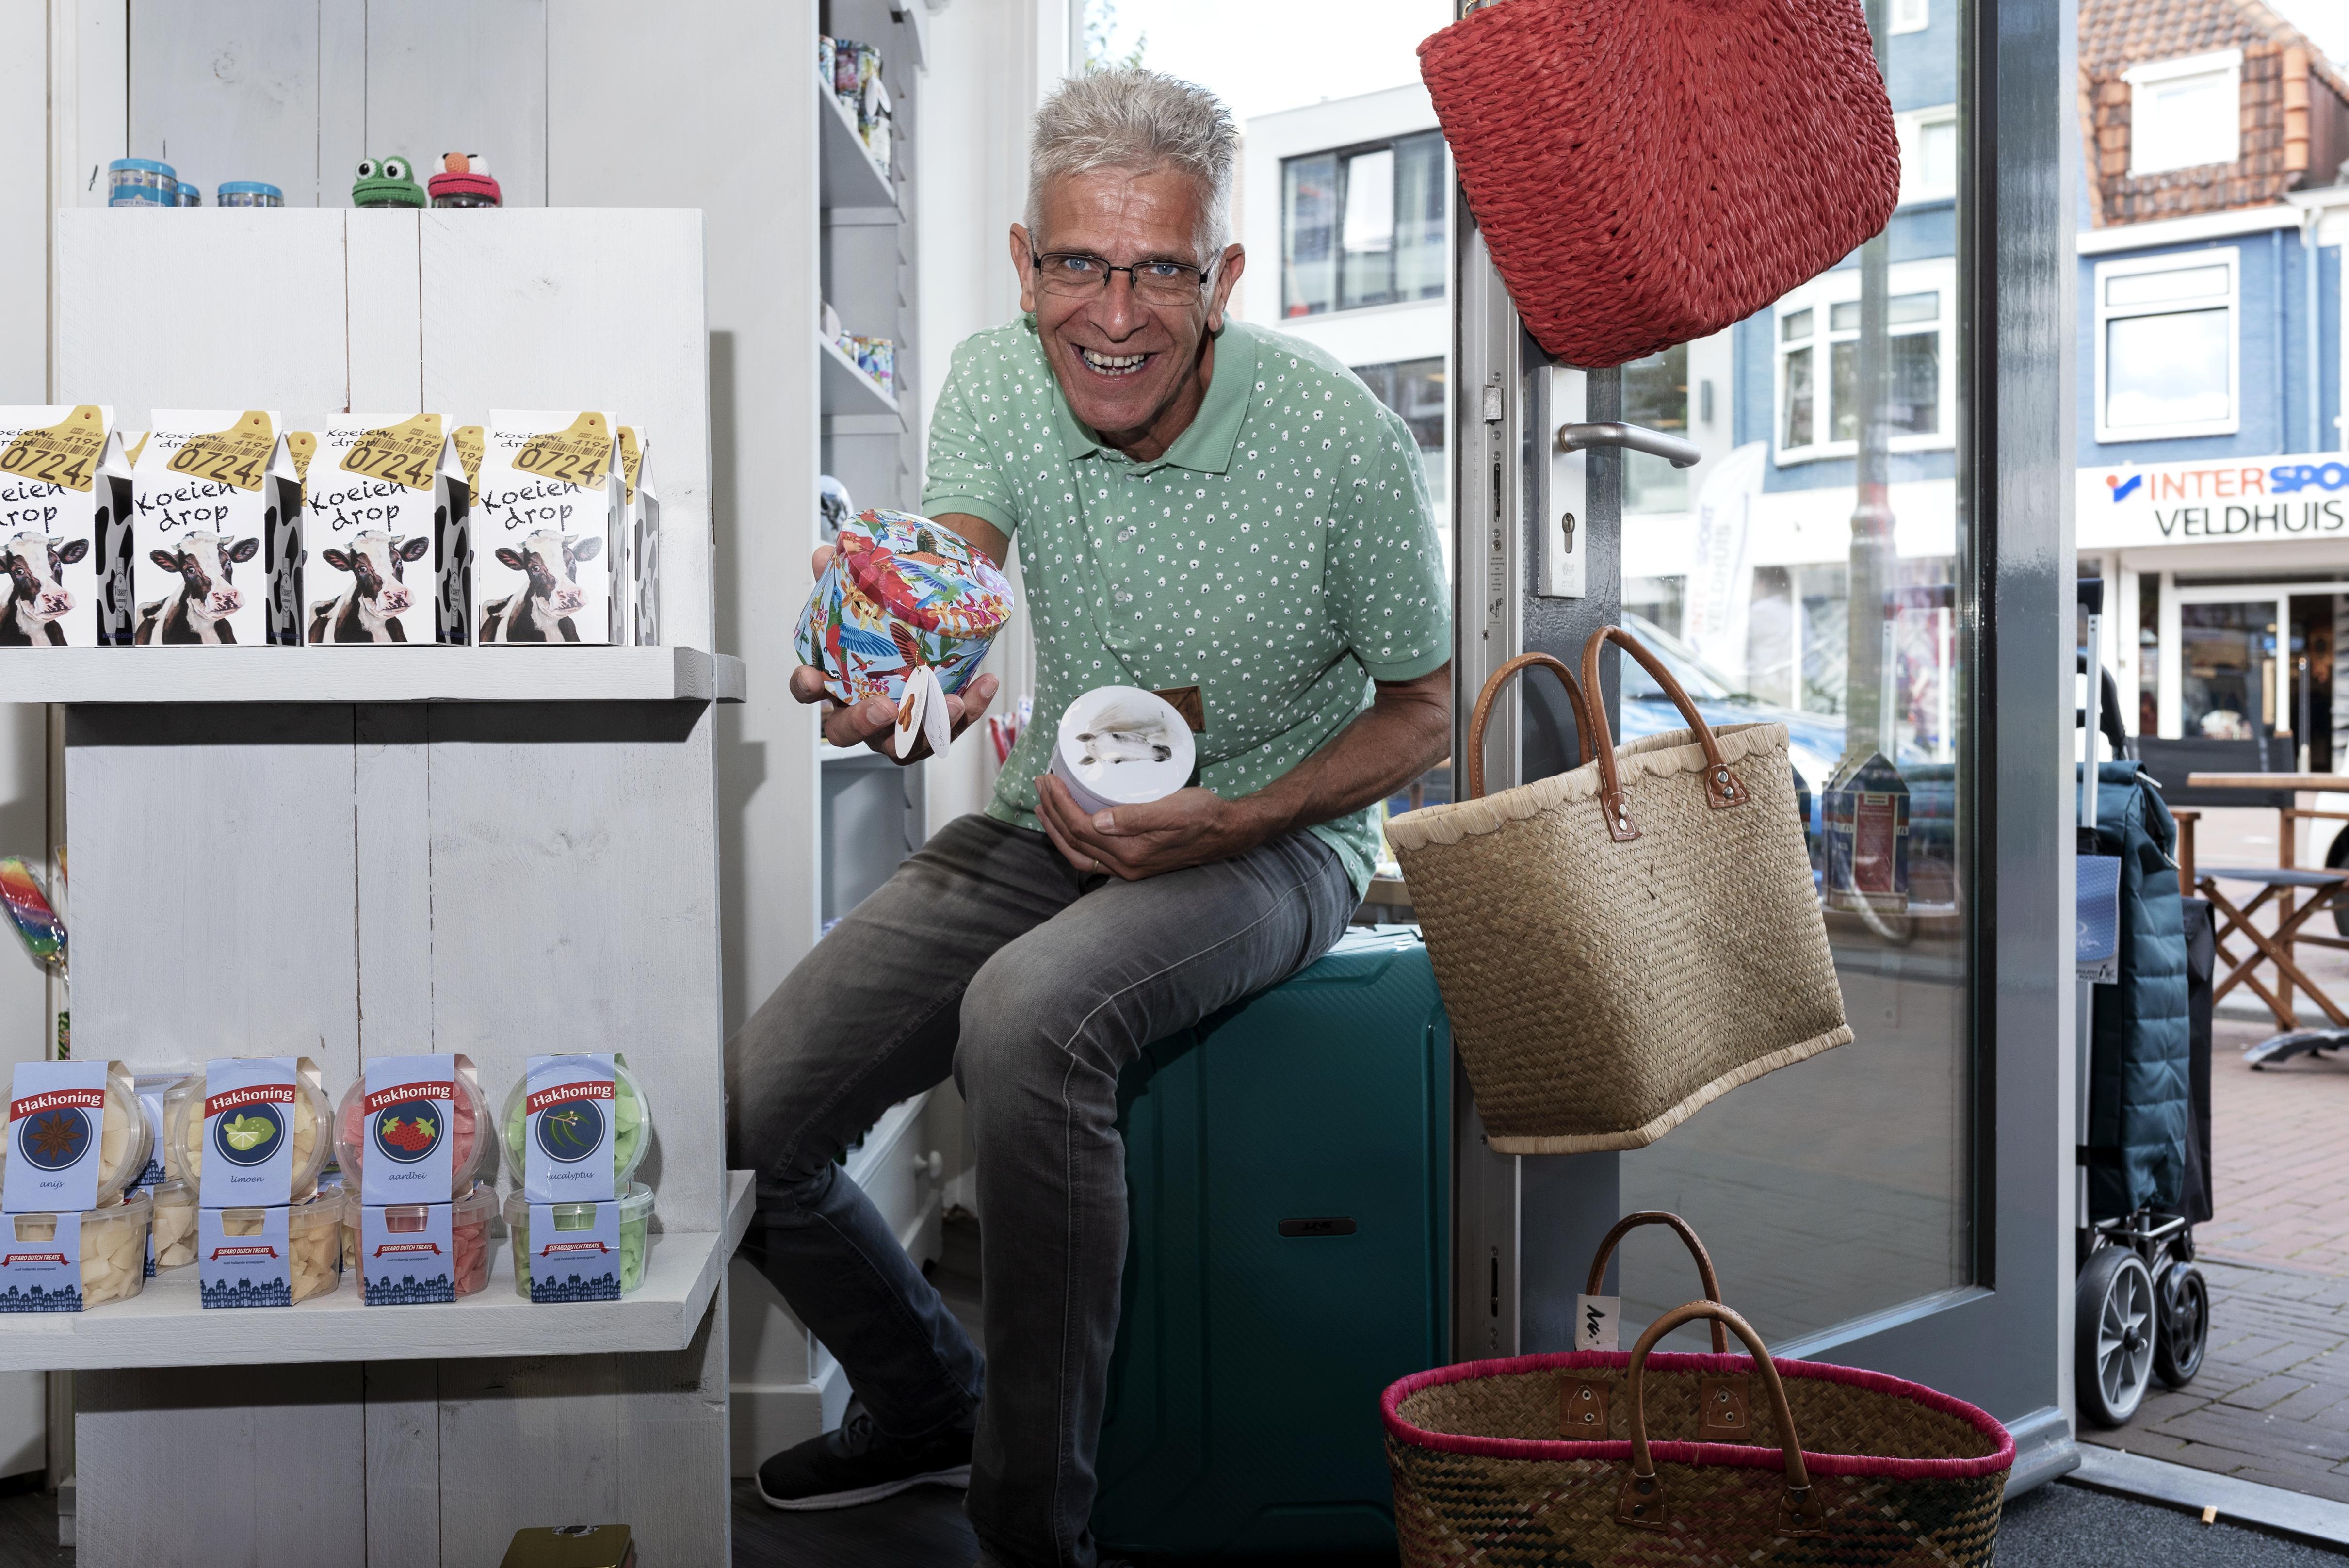 Tassenwinkel gaat nu ook oud-Hollands snoep verkopen